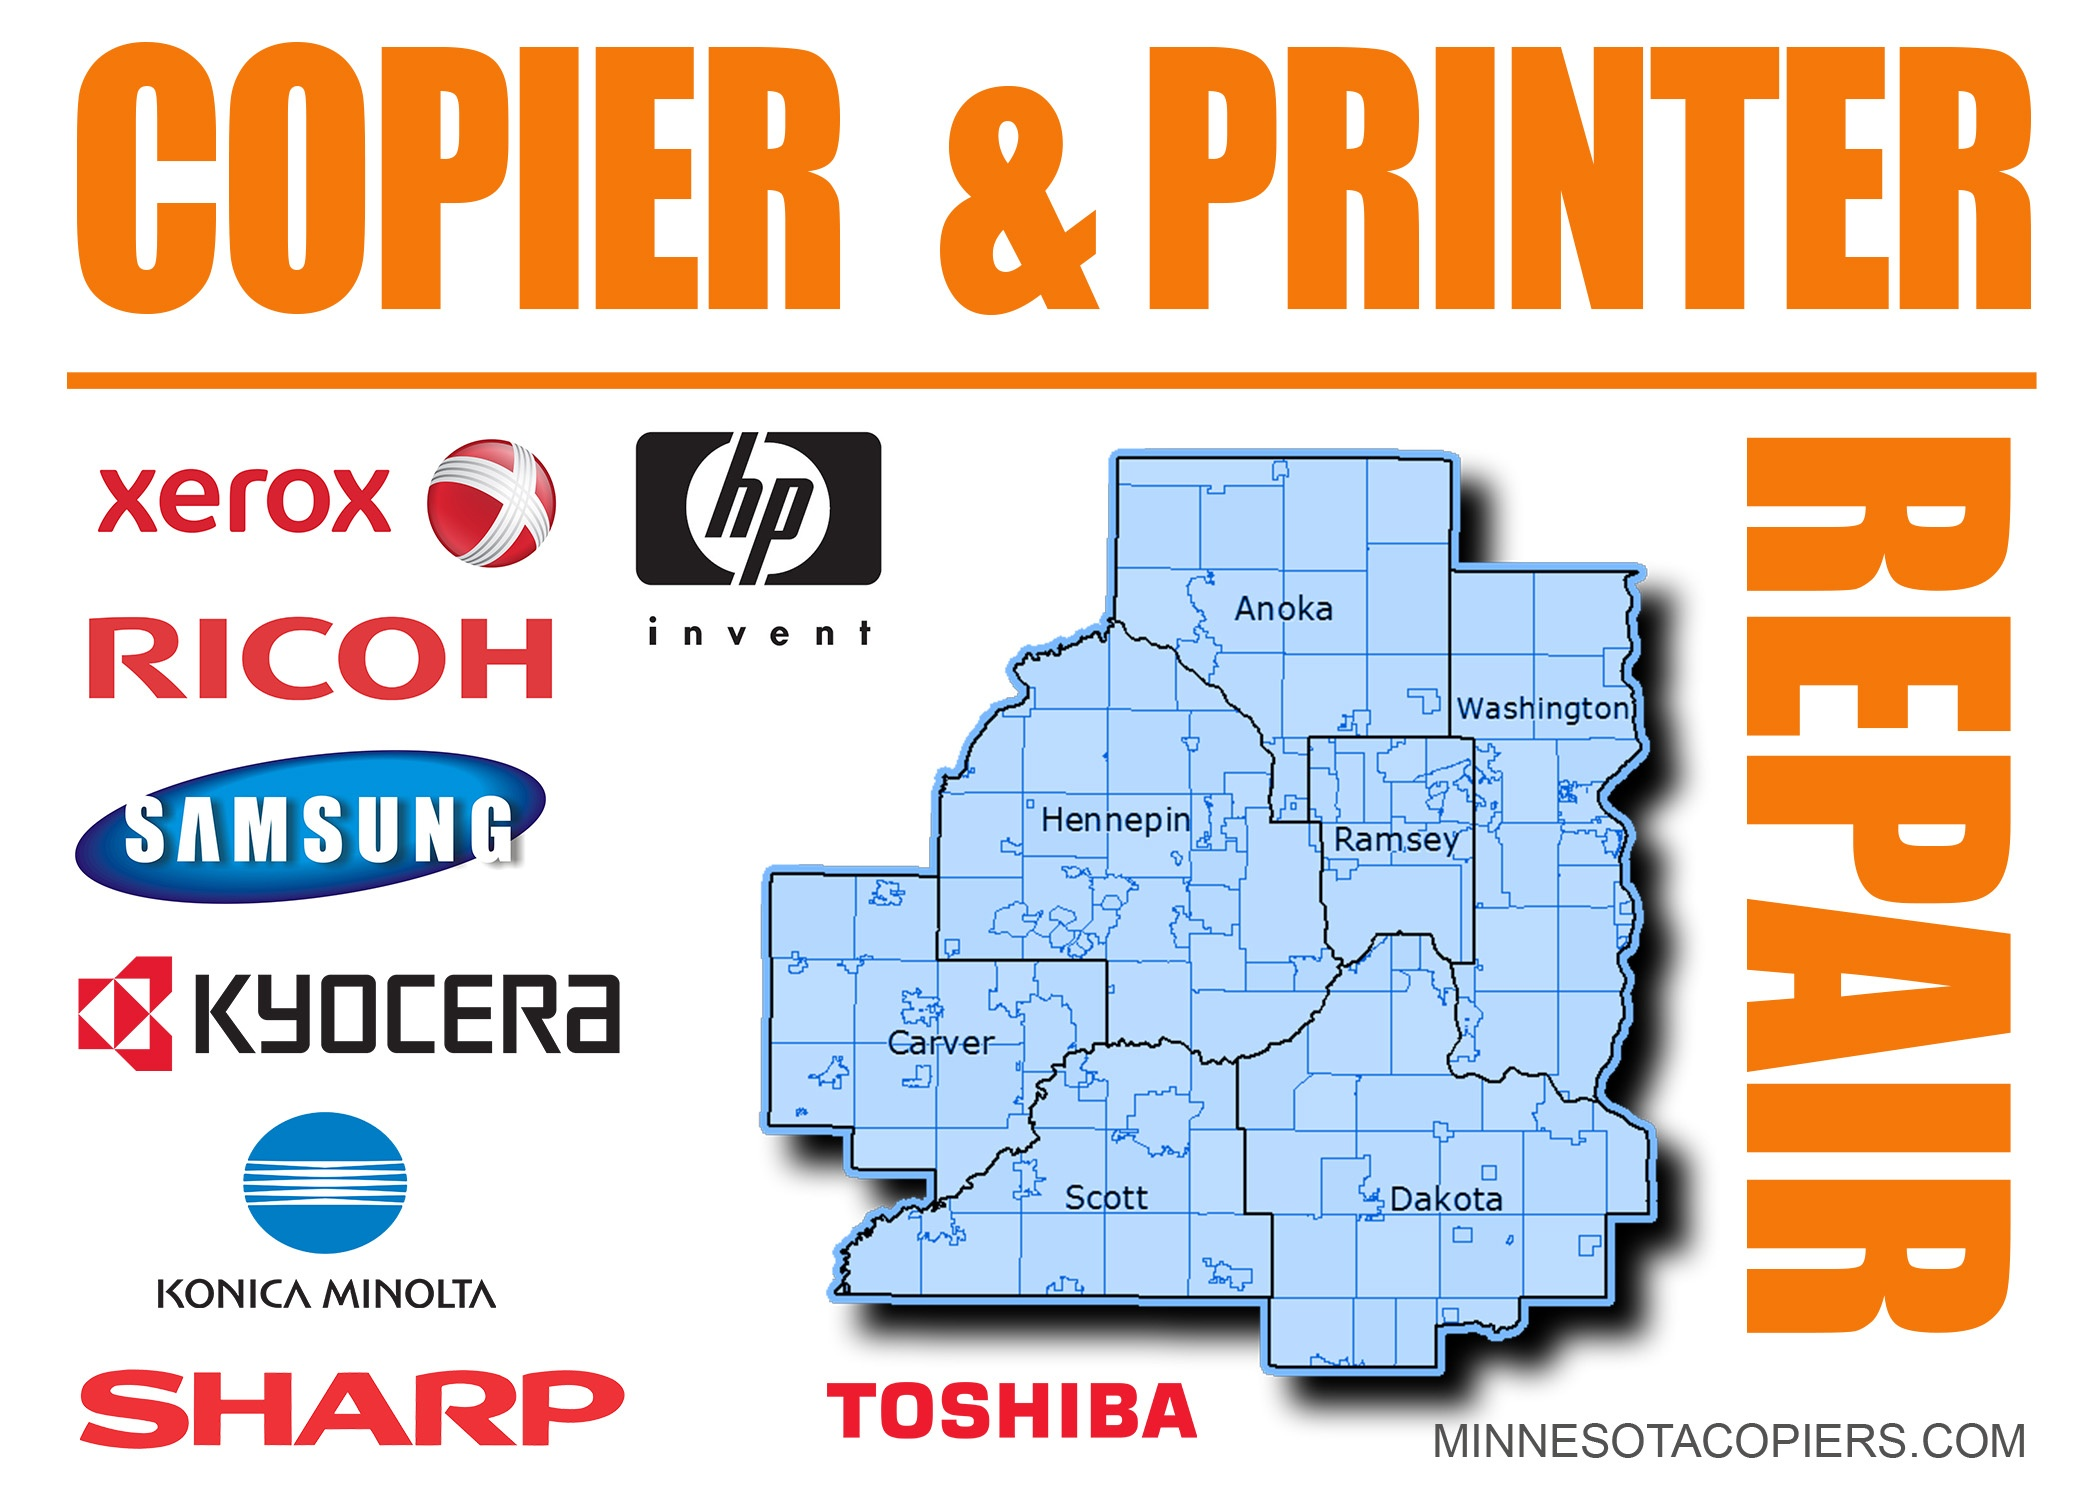 copier_printer_repair_service_MN.jpg